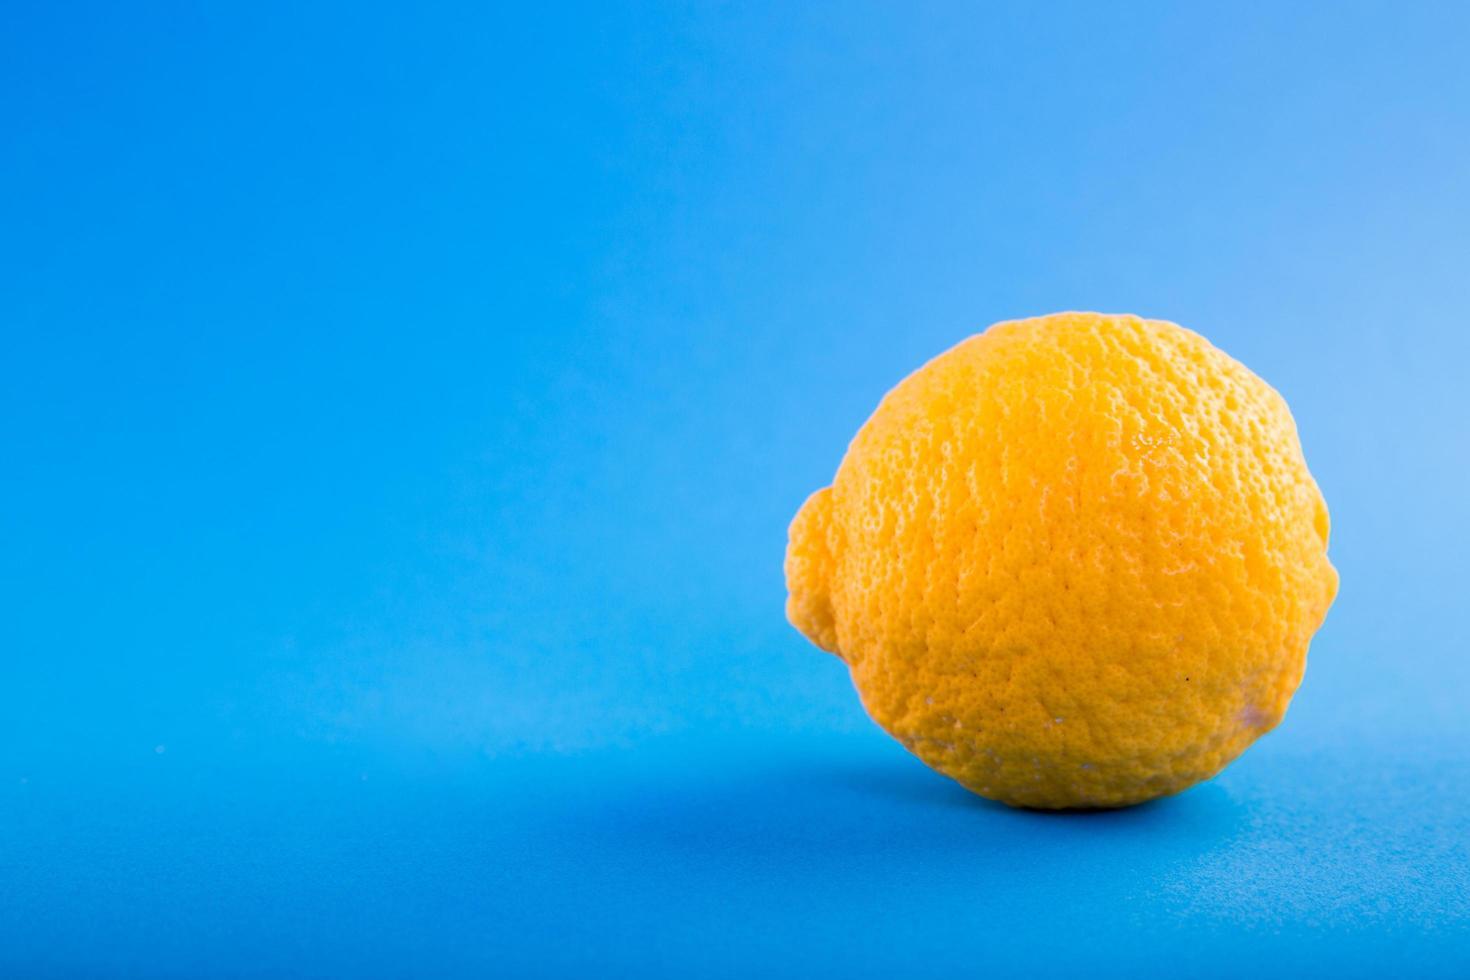 gul citron på blå bakgrund foto